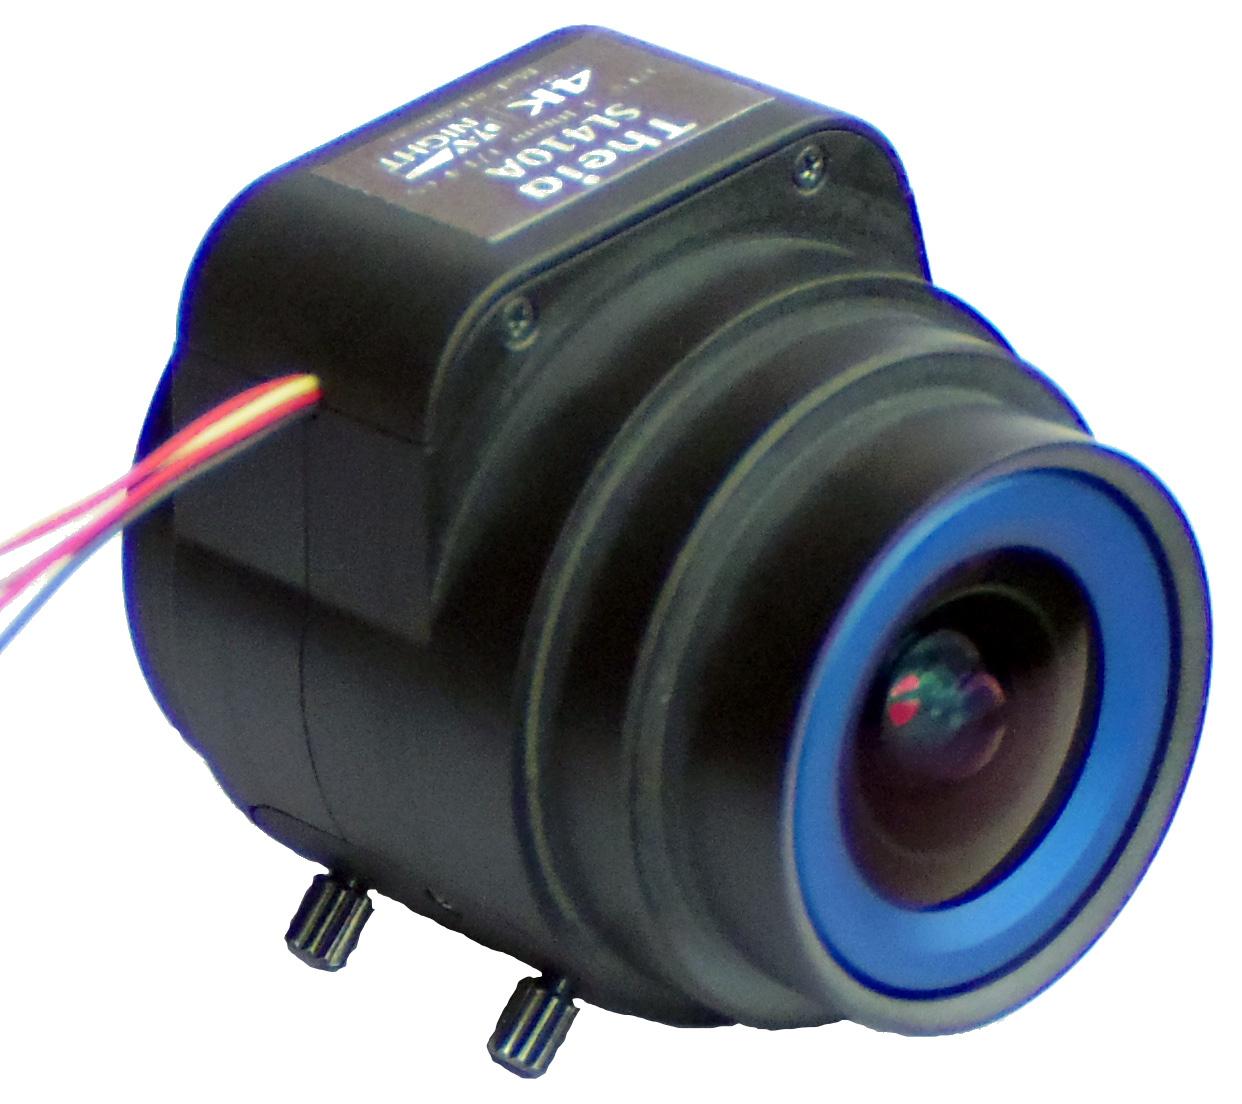 Theia ML410M lens